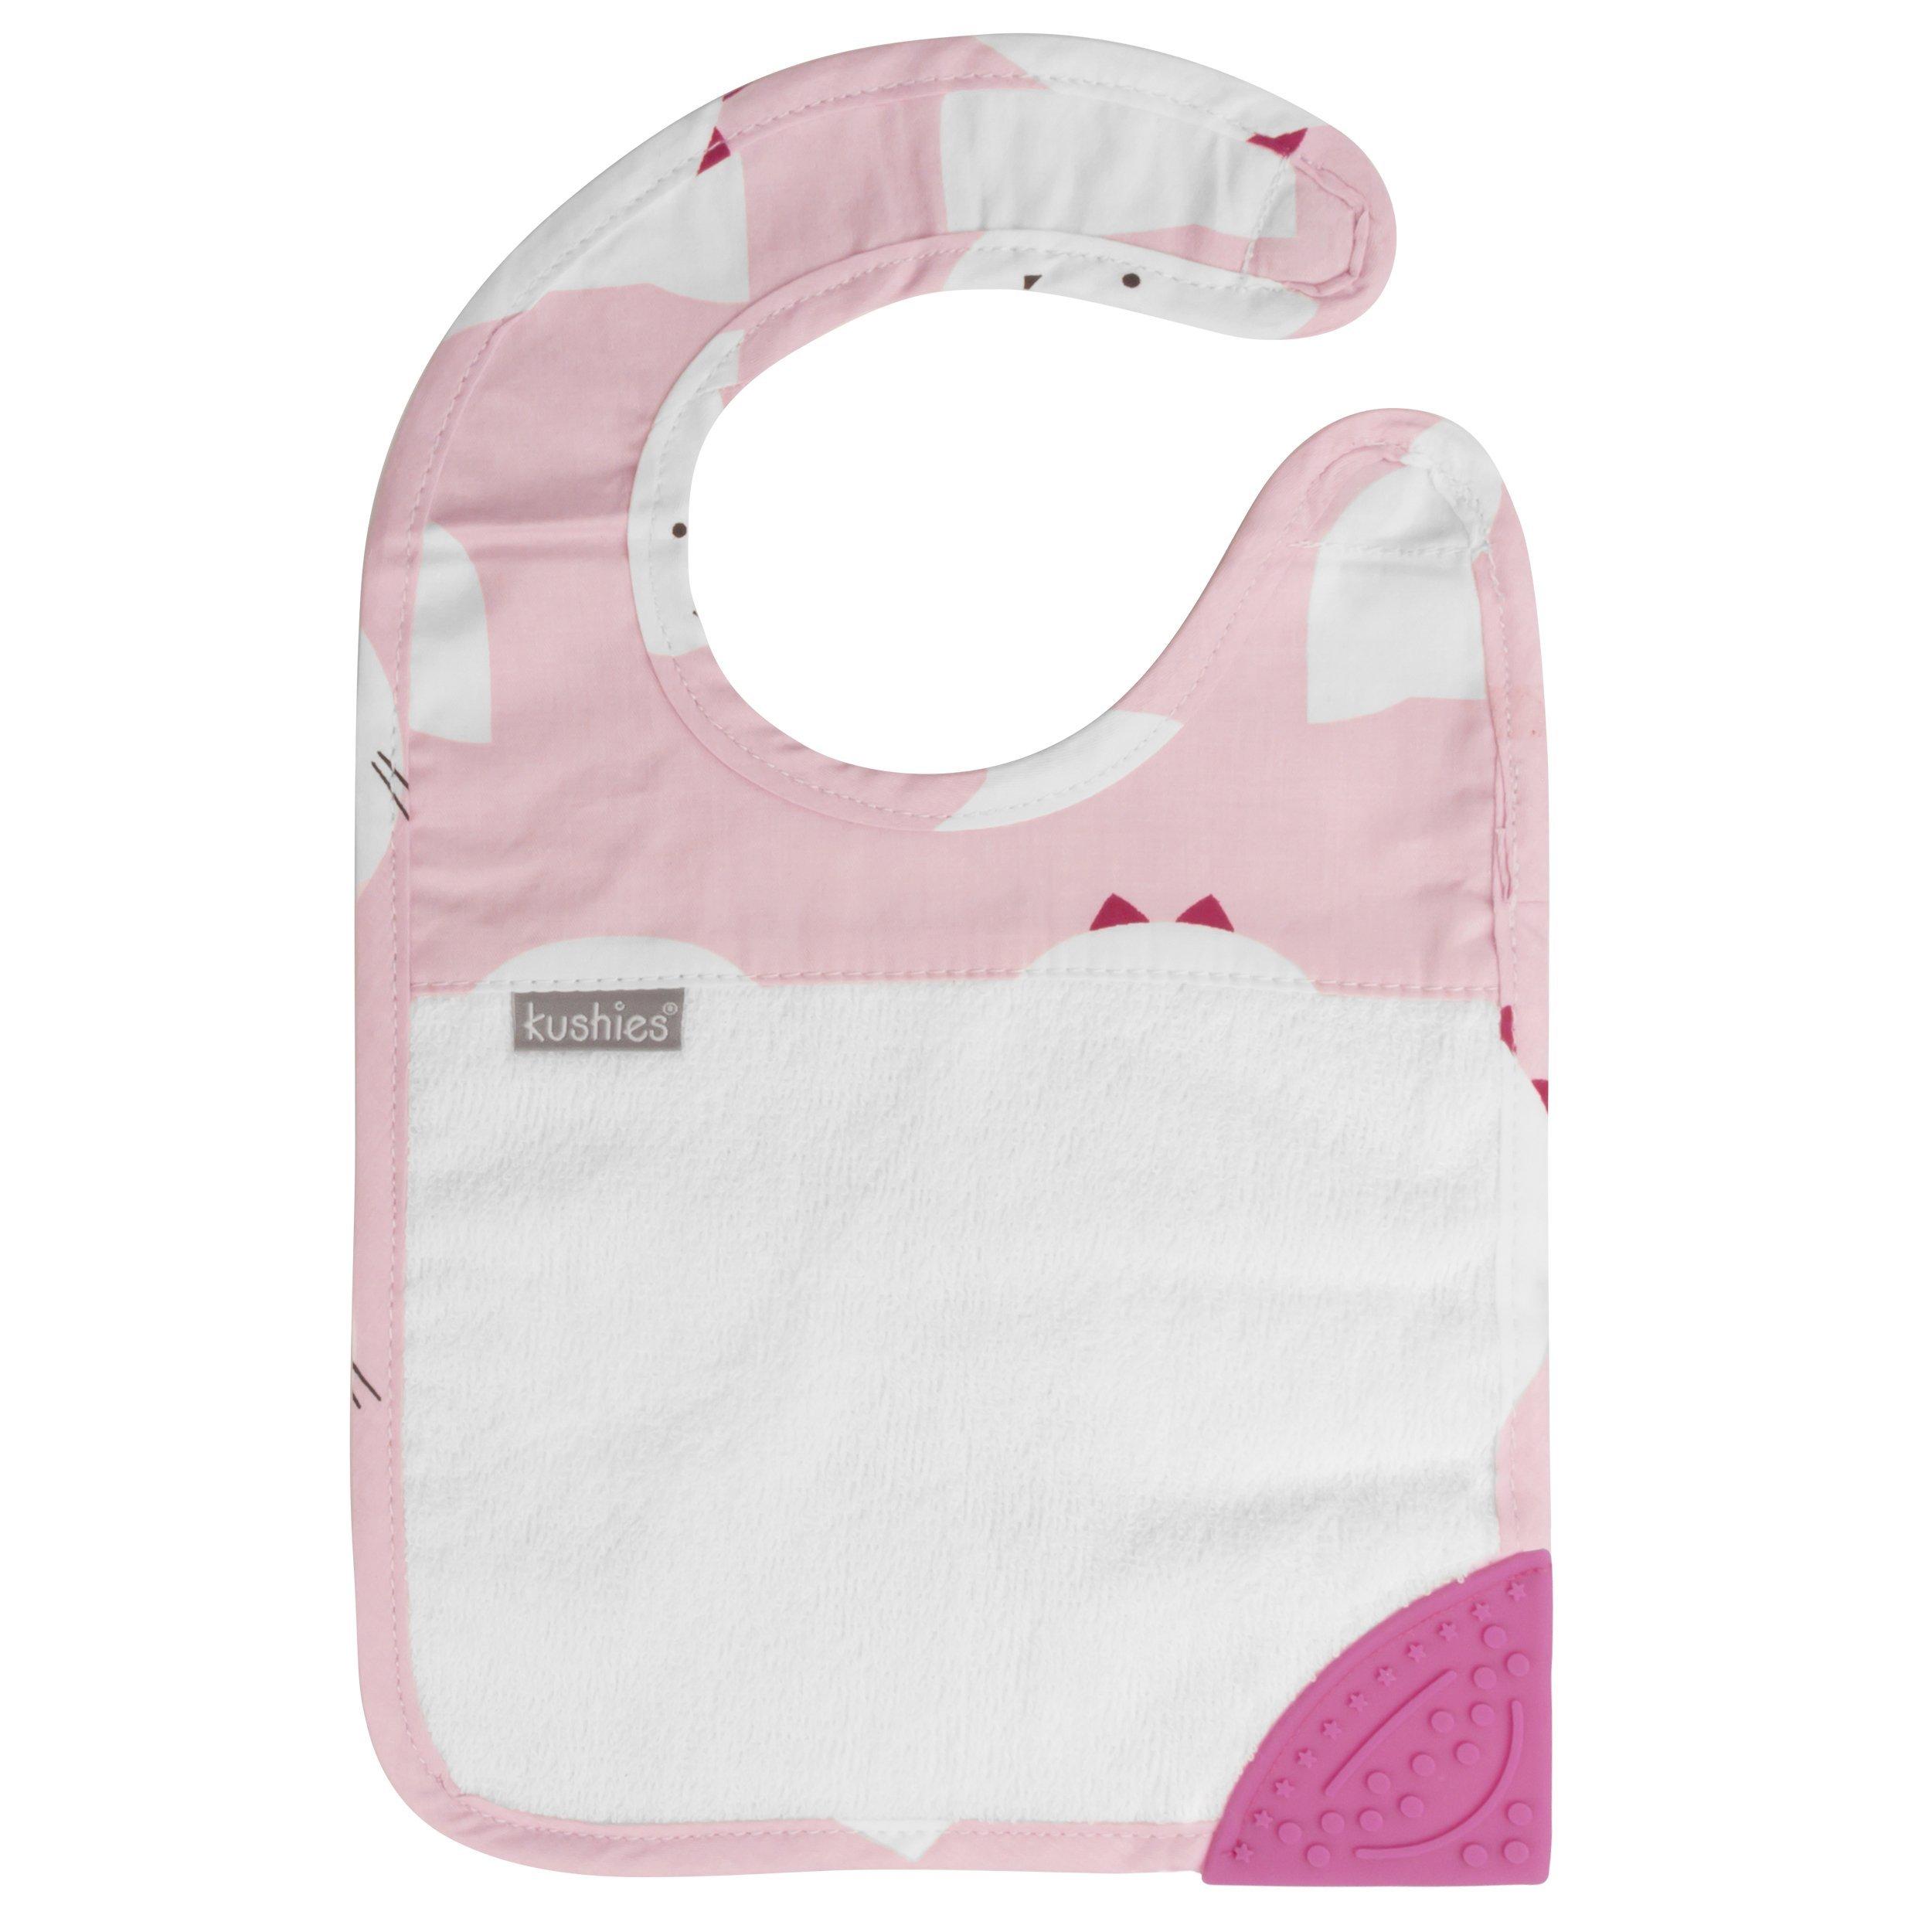 Kushies Silidrool Absorbent Terry Baby/Toodler Feeding & Teething Bib with BPA Free Silicone Teether, White/Pink